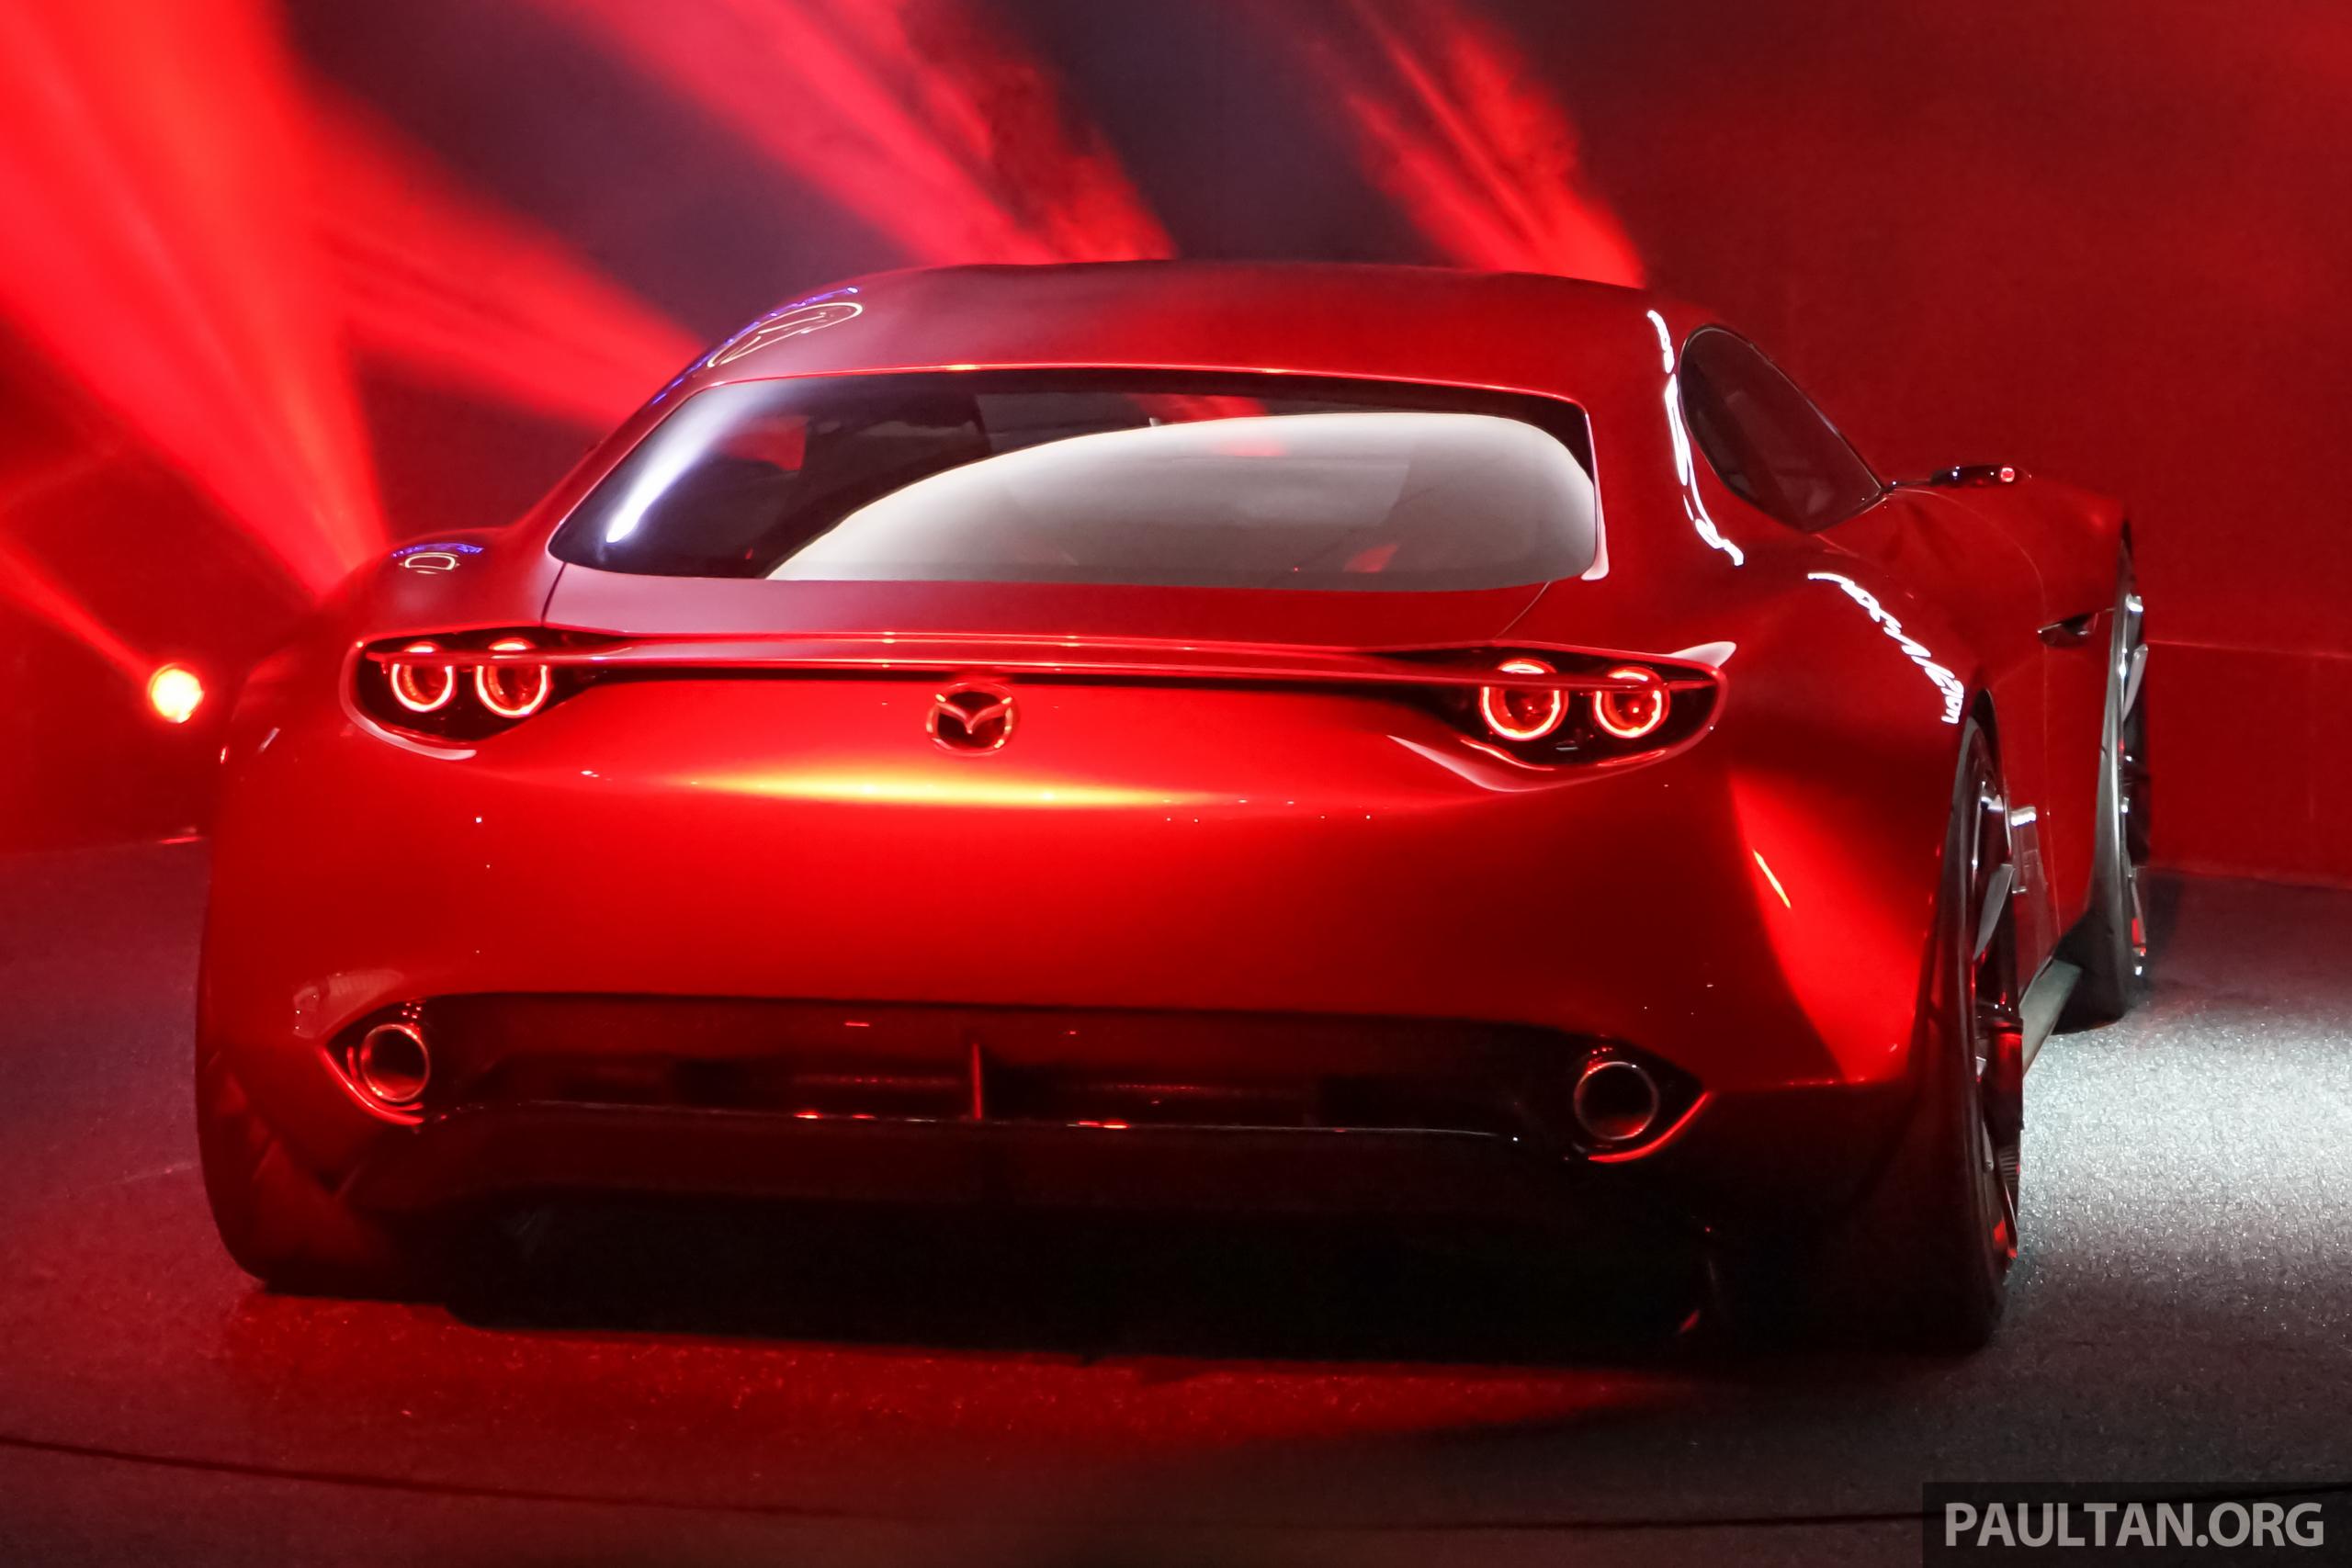 https://s2.paultan.org/image/2015/10/Mazda-RX-Vision-3.jpg